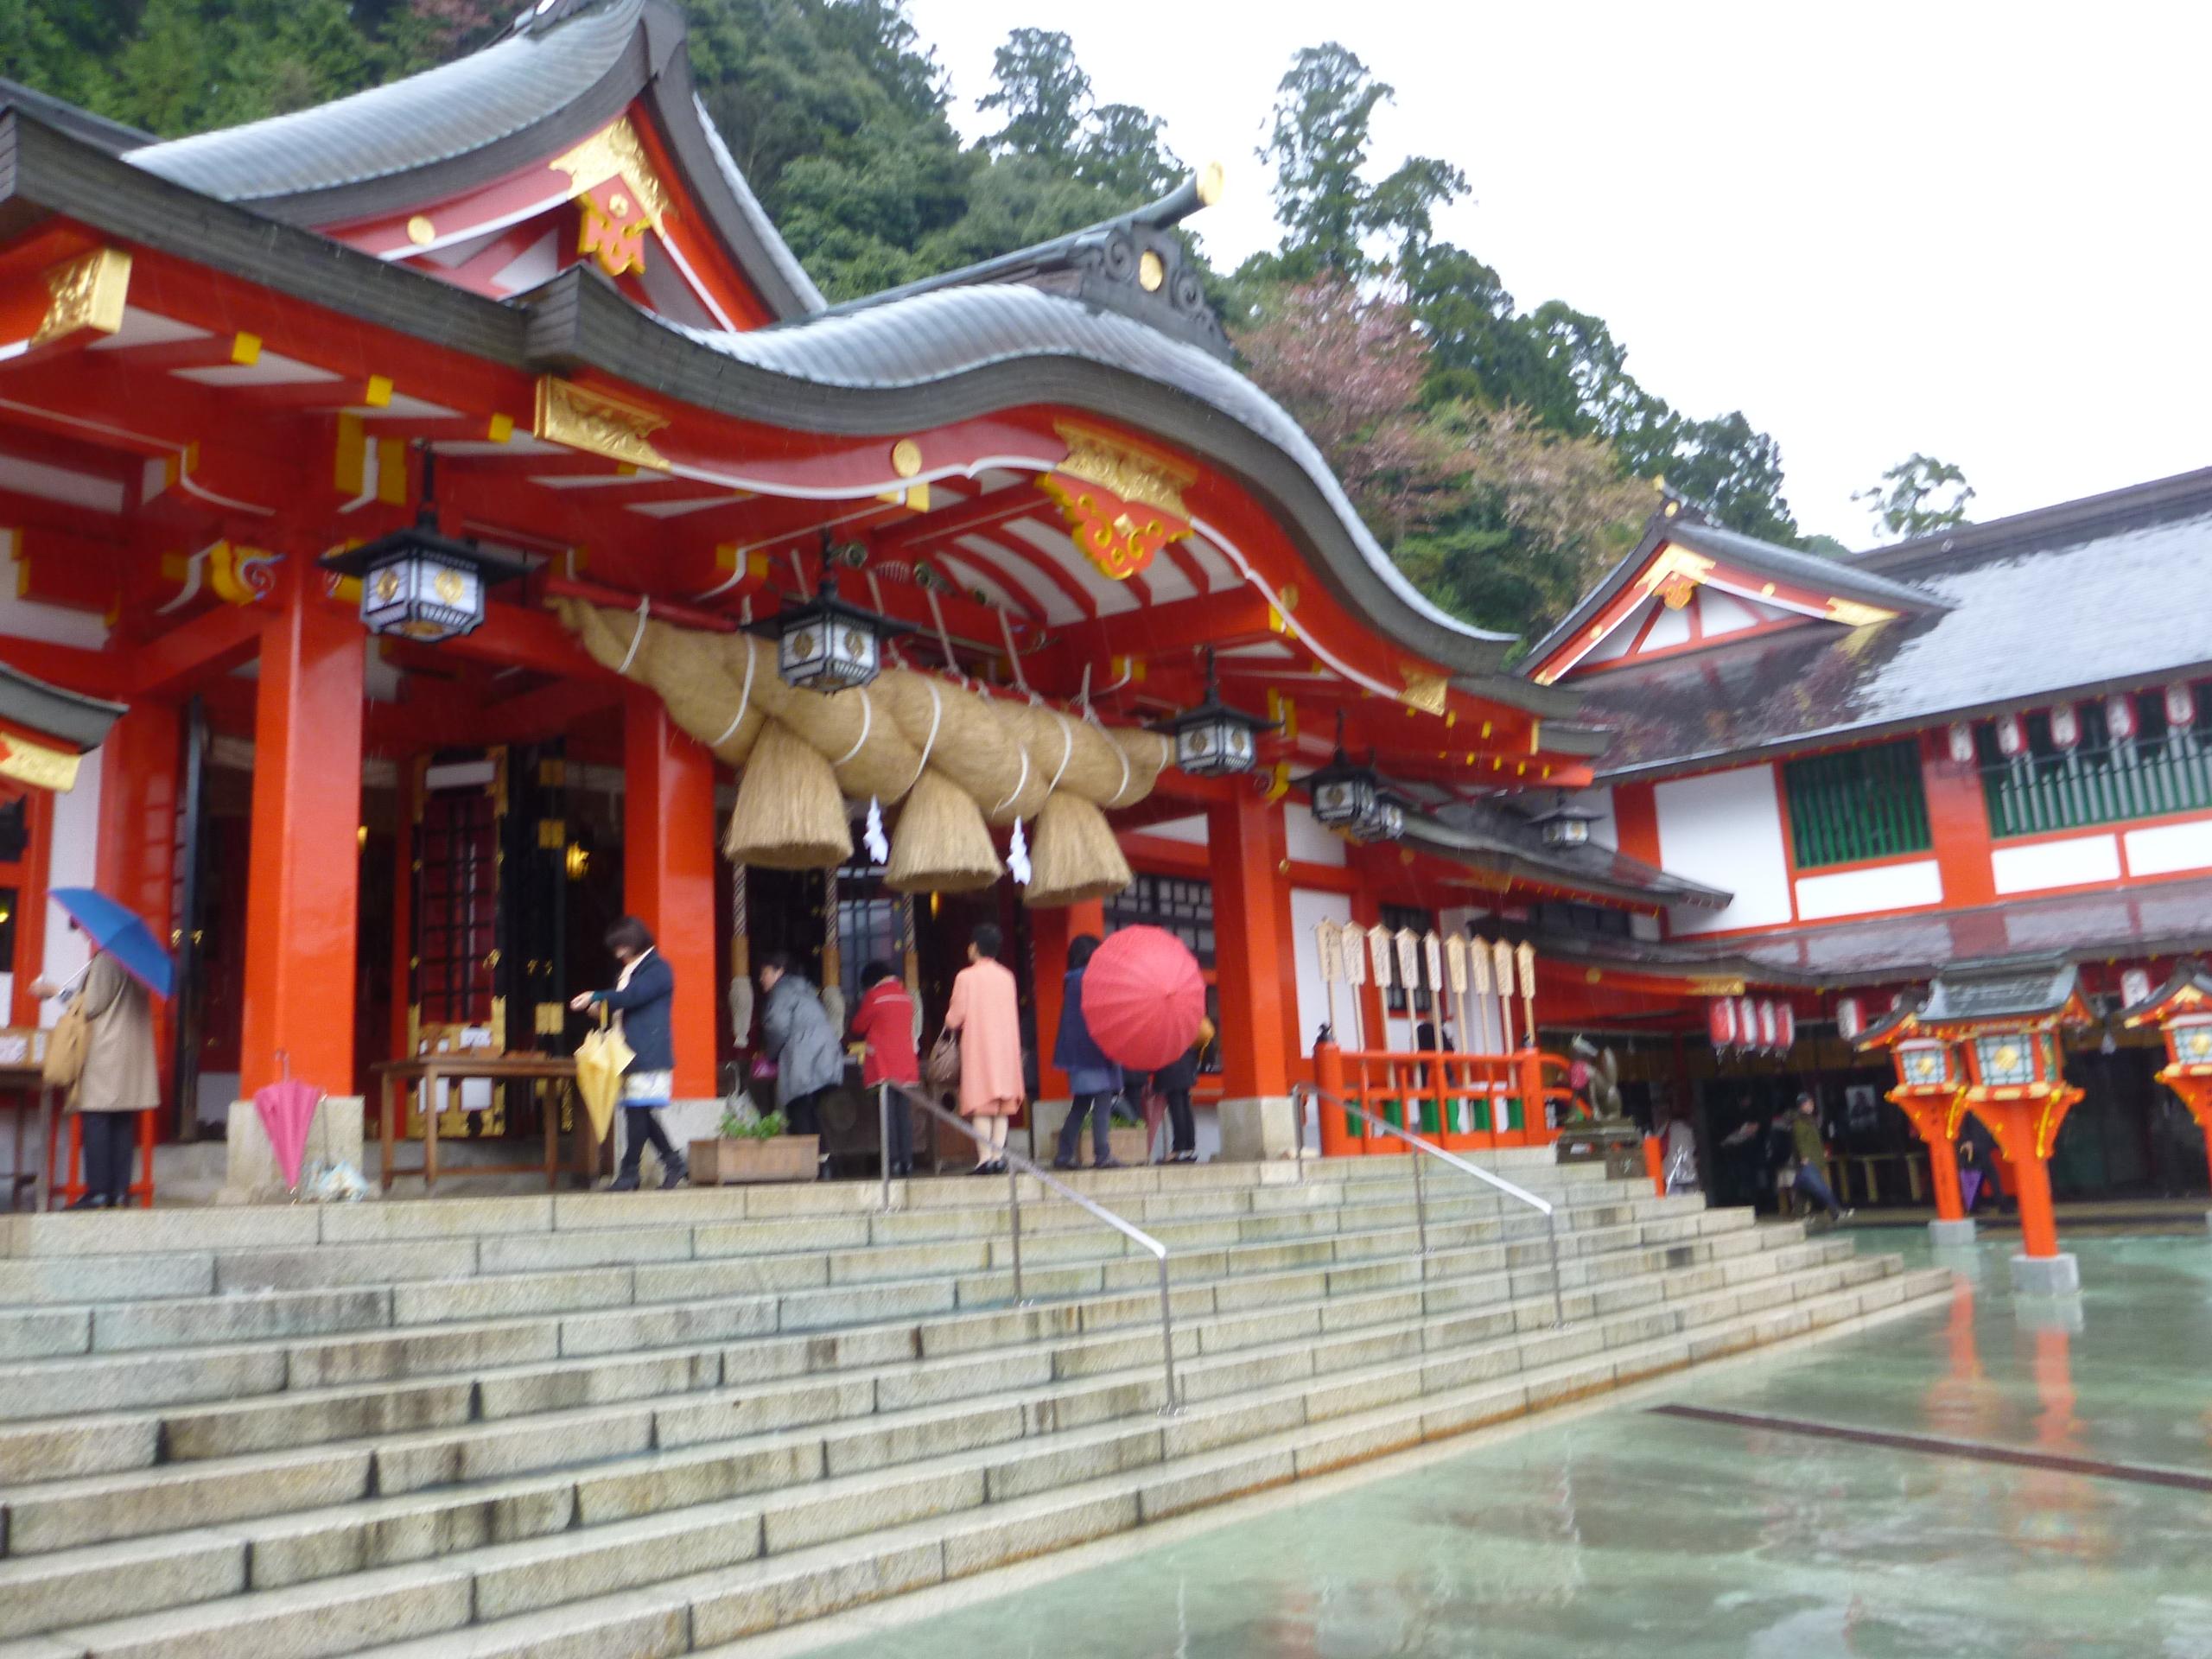 Japan, Japanese, shrine, traditional, history, historical